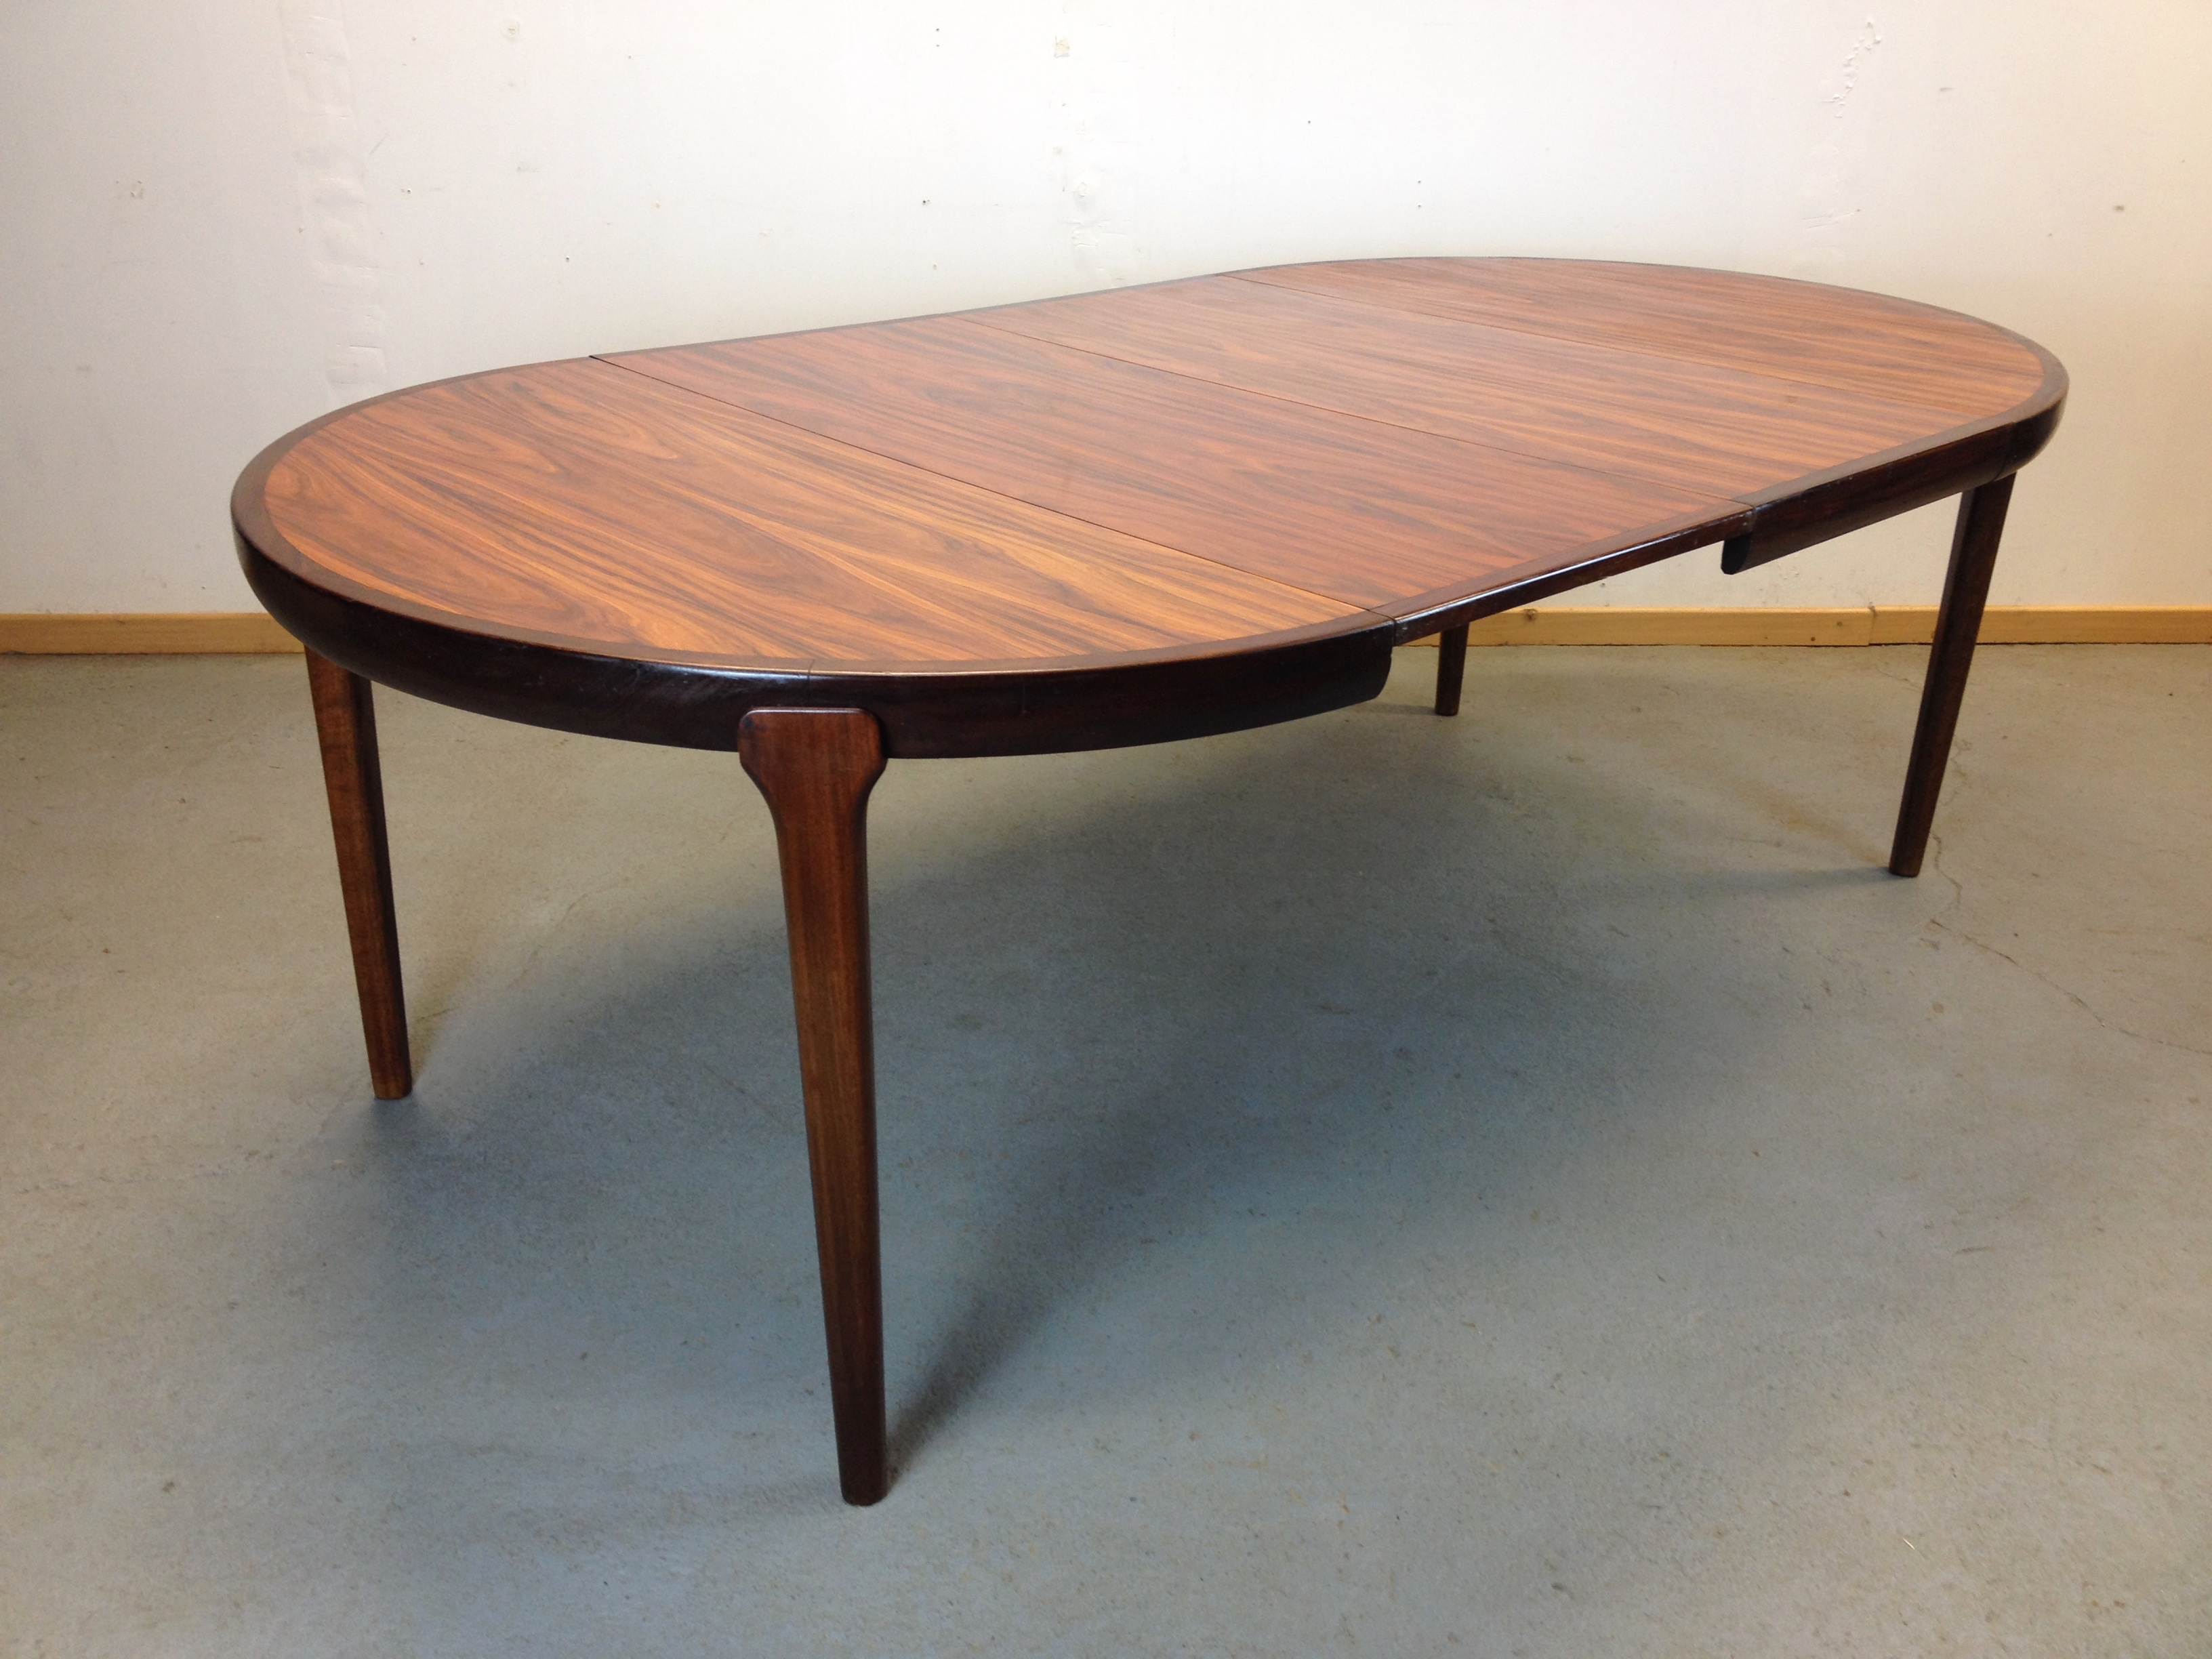 table scandinave palissandre ann e 60. Black Bedroom Furniture Sets. Home Design Ideas